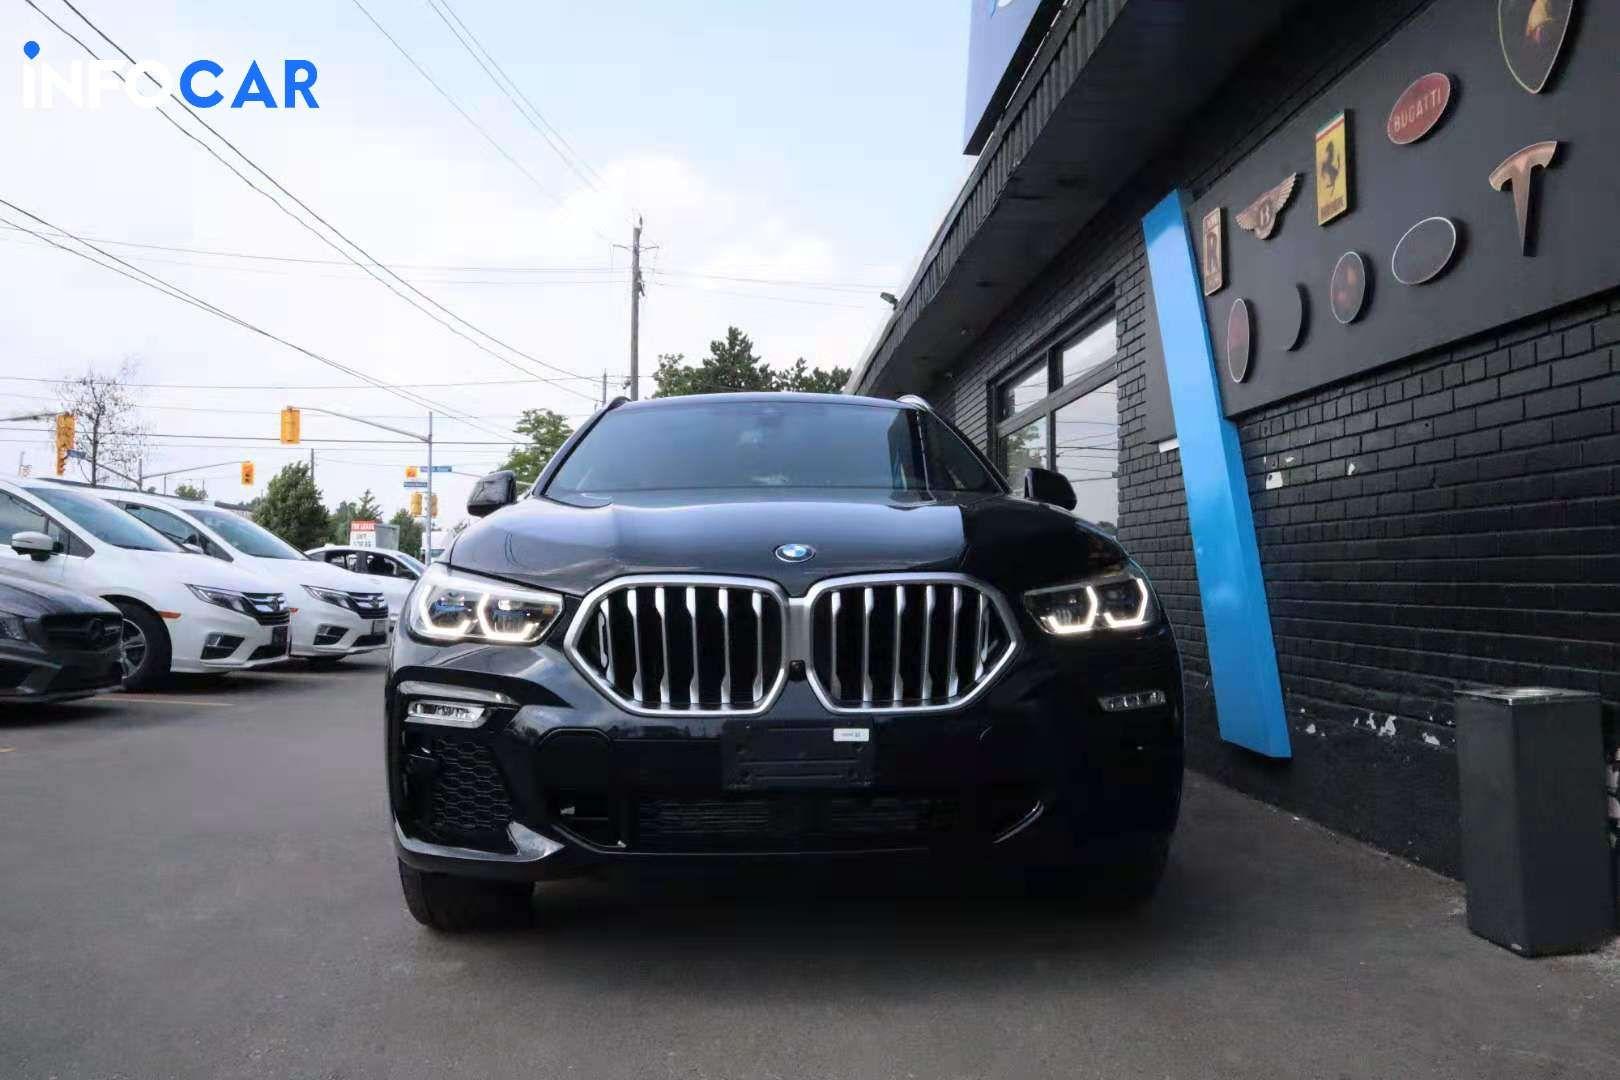 2021 BMW X6 40i - INFOCAR - Toronto's Most Comprehensive New and Used Auto Trading Platform